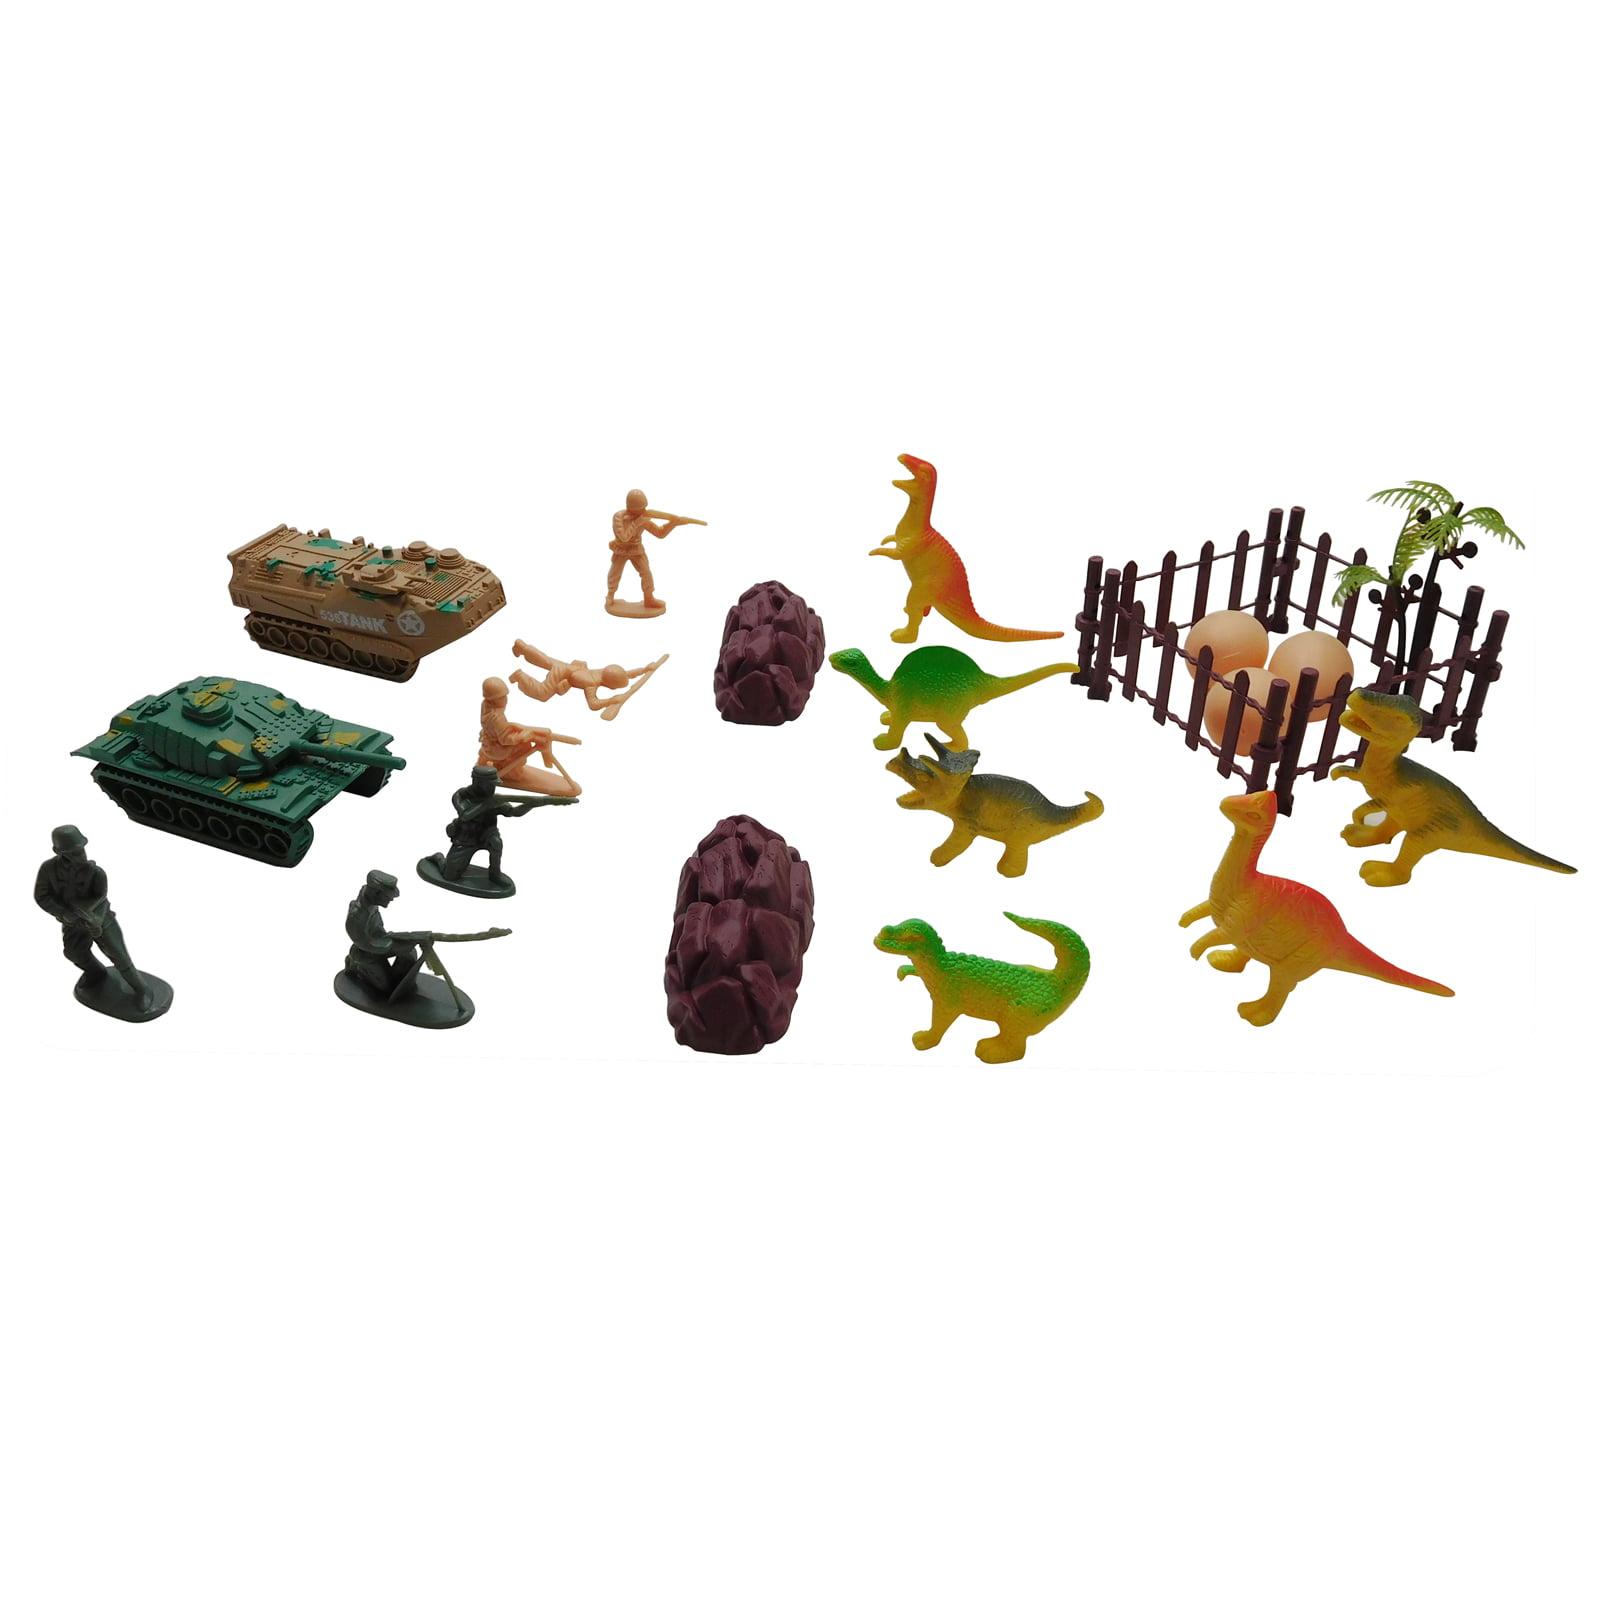 21pc Battle Dinosaur vs Army Men Combat Action Figure Set by KidFun Products